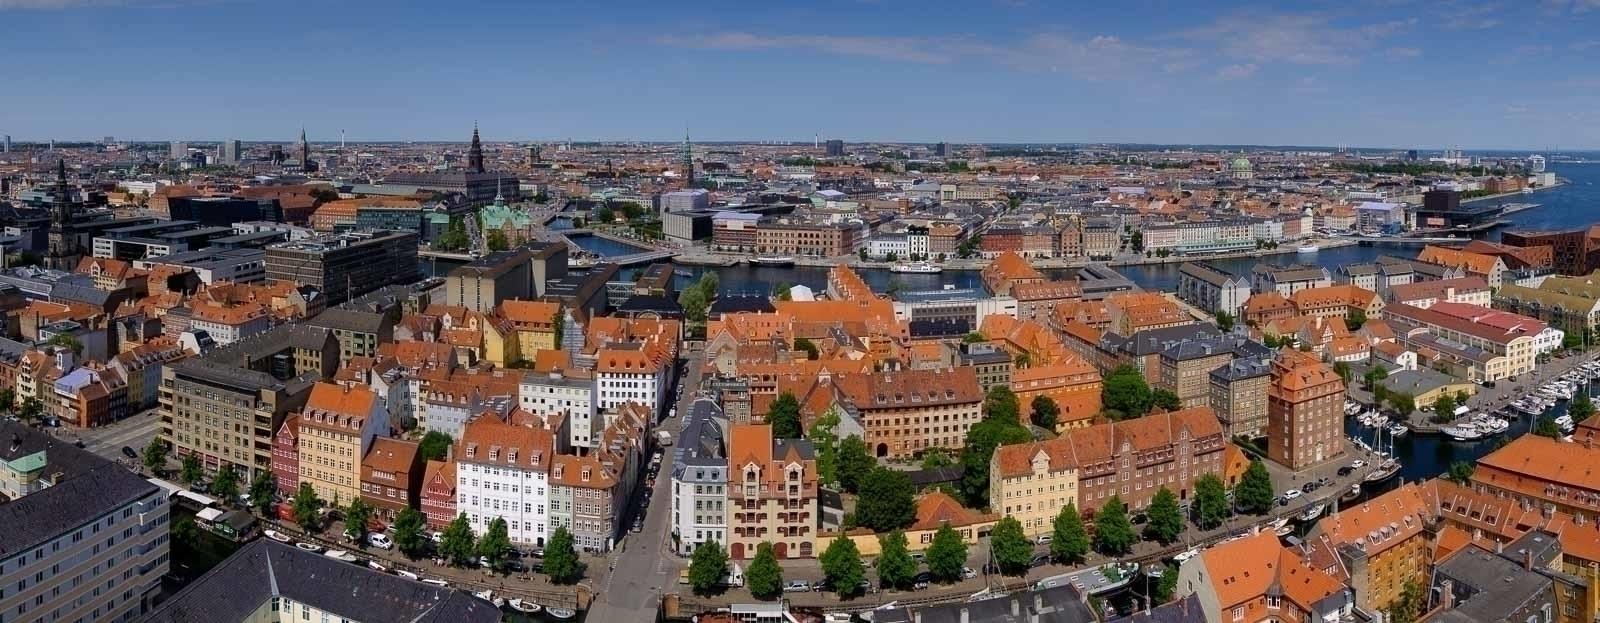 Panorama View Kopenhagen Vor Fr - velviake | ello